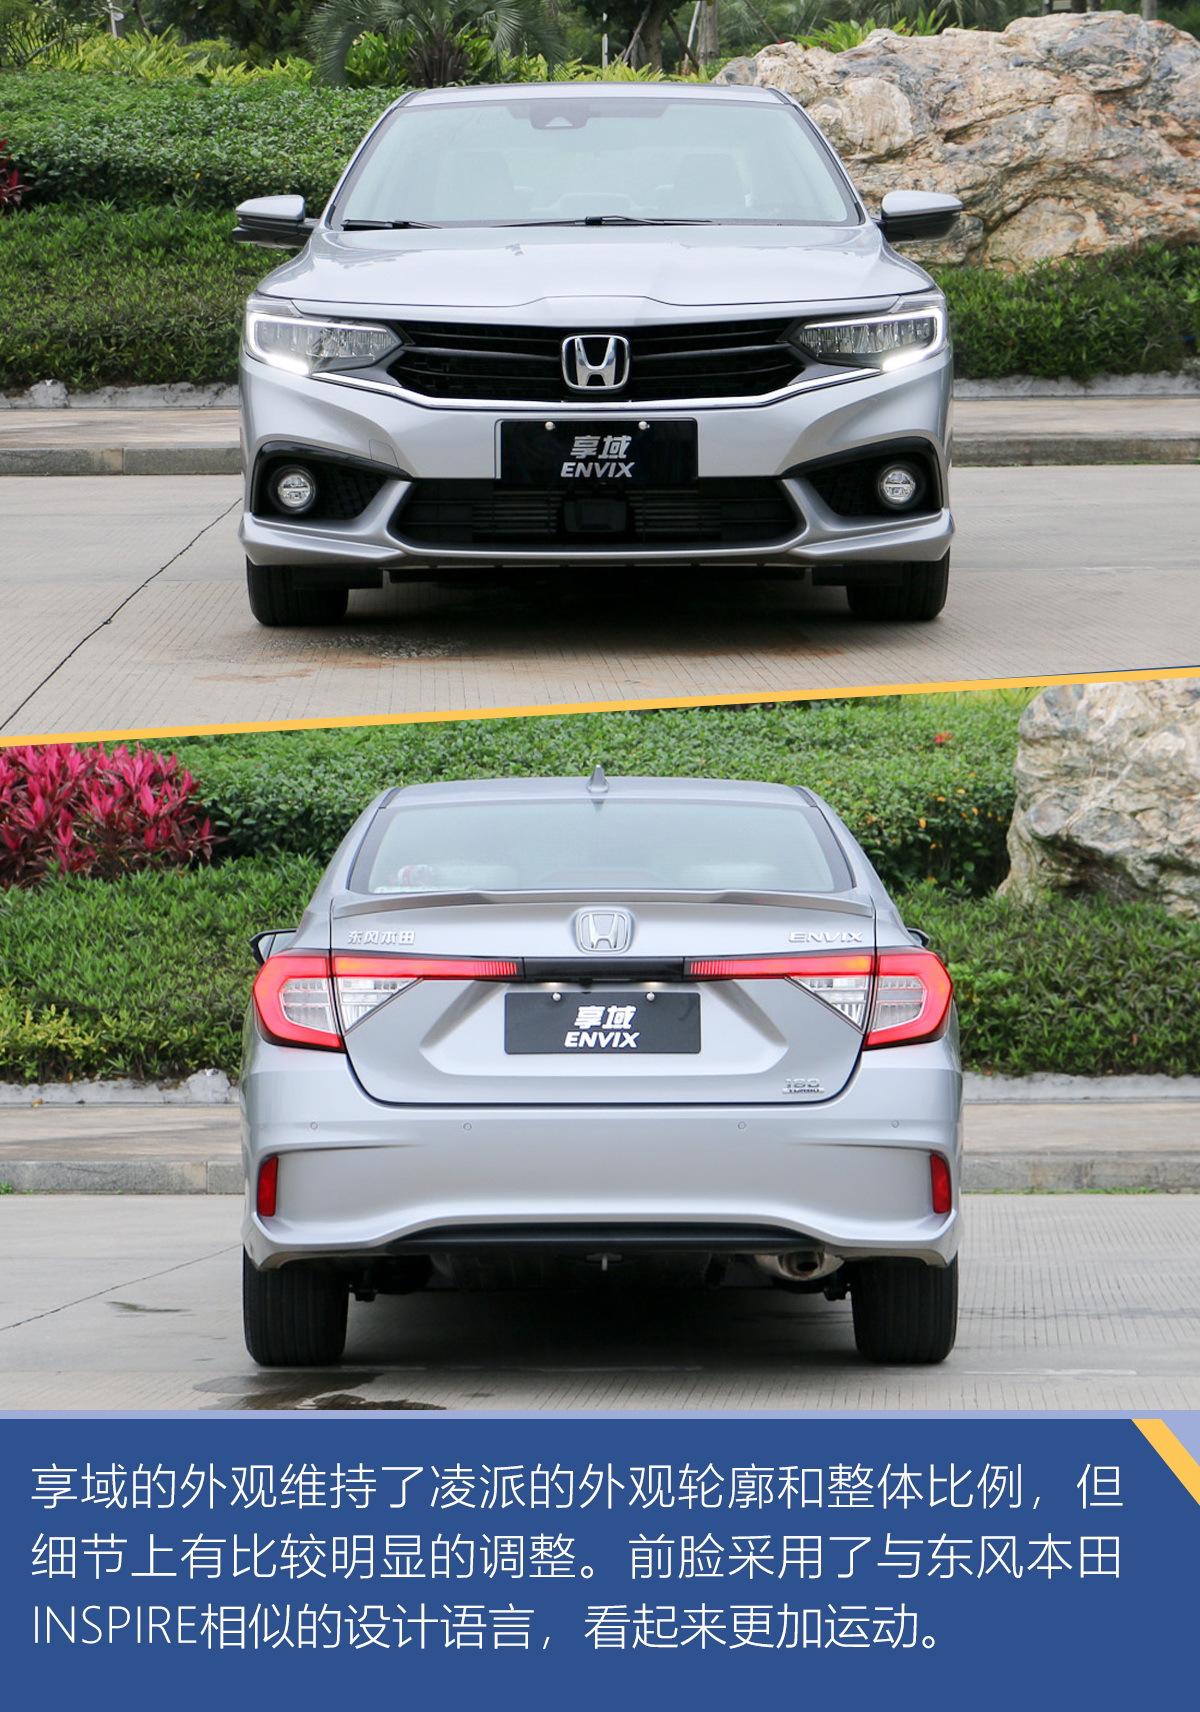 2013 Honda Crider